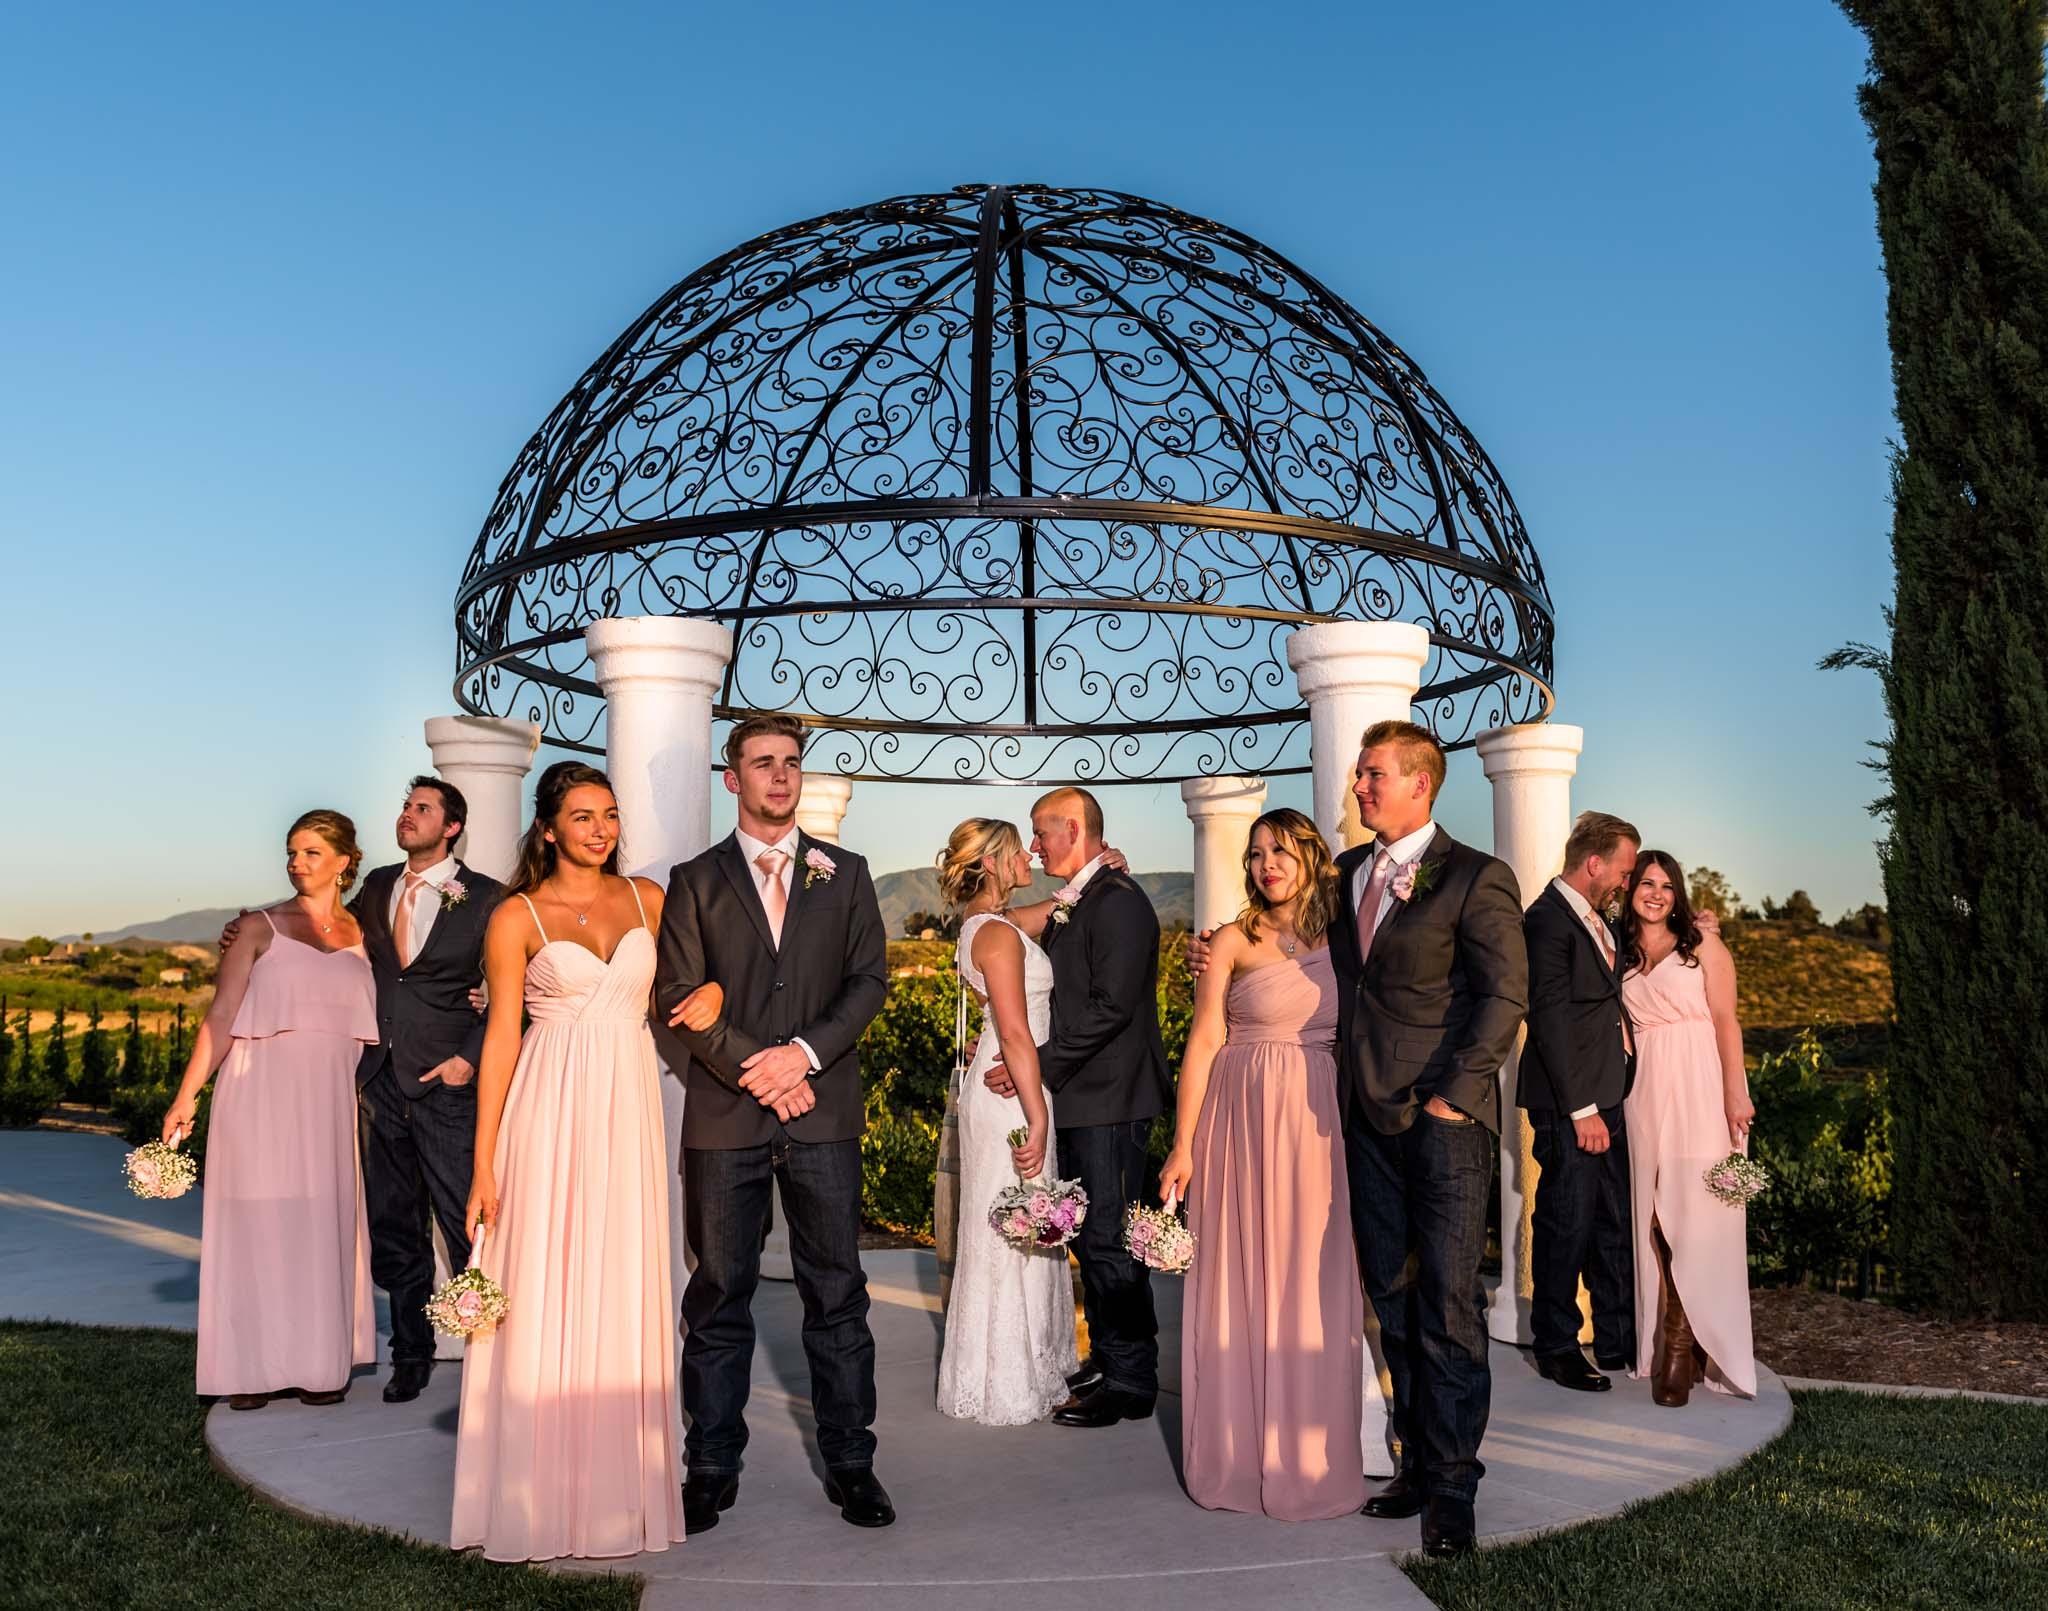 Avensole-Winery-Temecula-Wedding-Josh-and-Olivia-3749.JPG